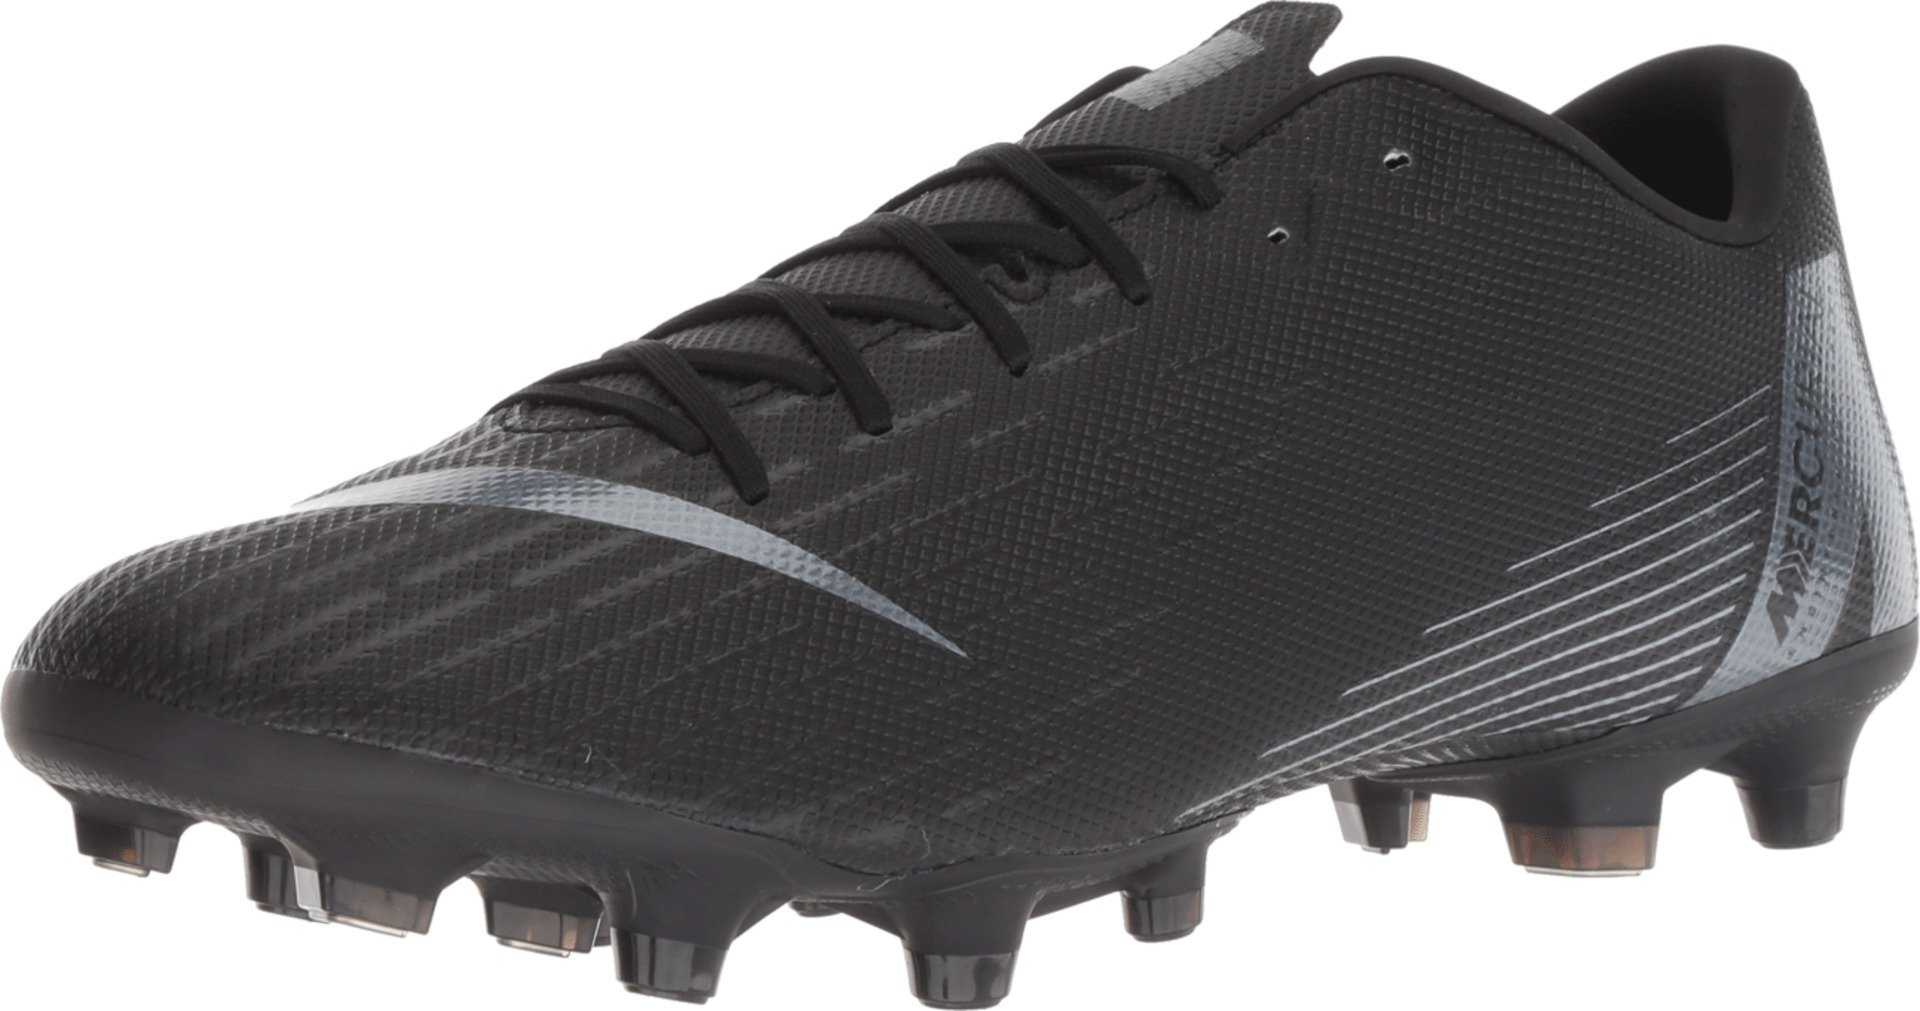 58c92a9dff3 Galleon - NIKE Mercurial Vapor 12 Academy MG Soccer Cleat (Black) (Men s  7.5 Women s 9)